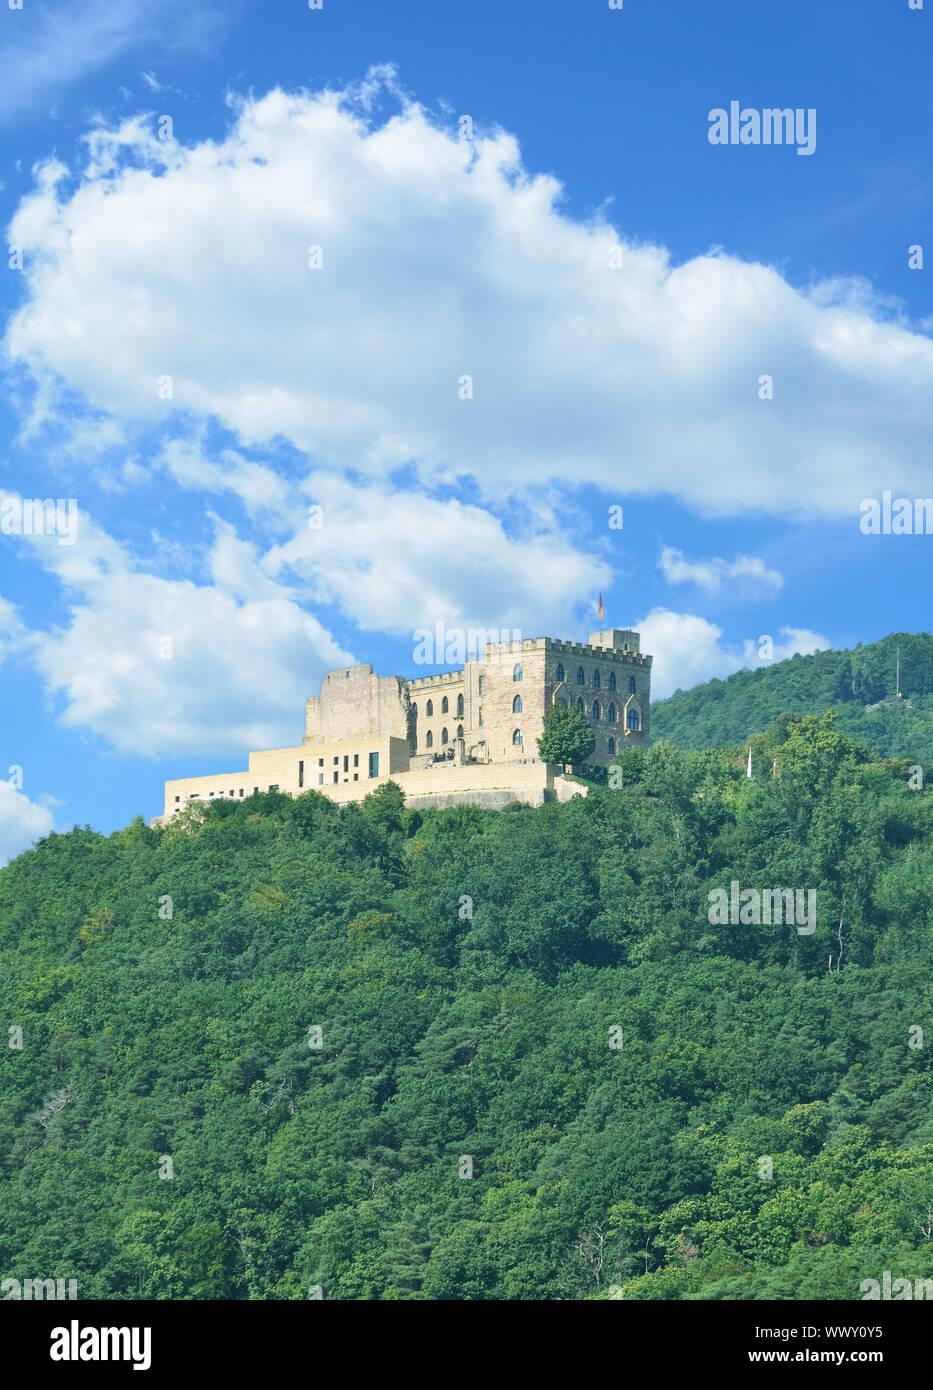 Hambach Castle near Neustadt an der Weinstrasse,Rhineland-Palatinate,Germany Stock Photo